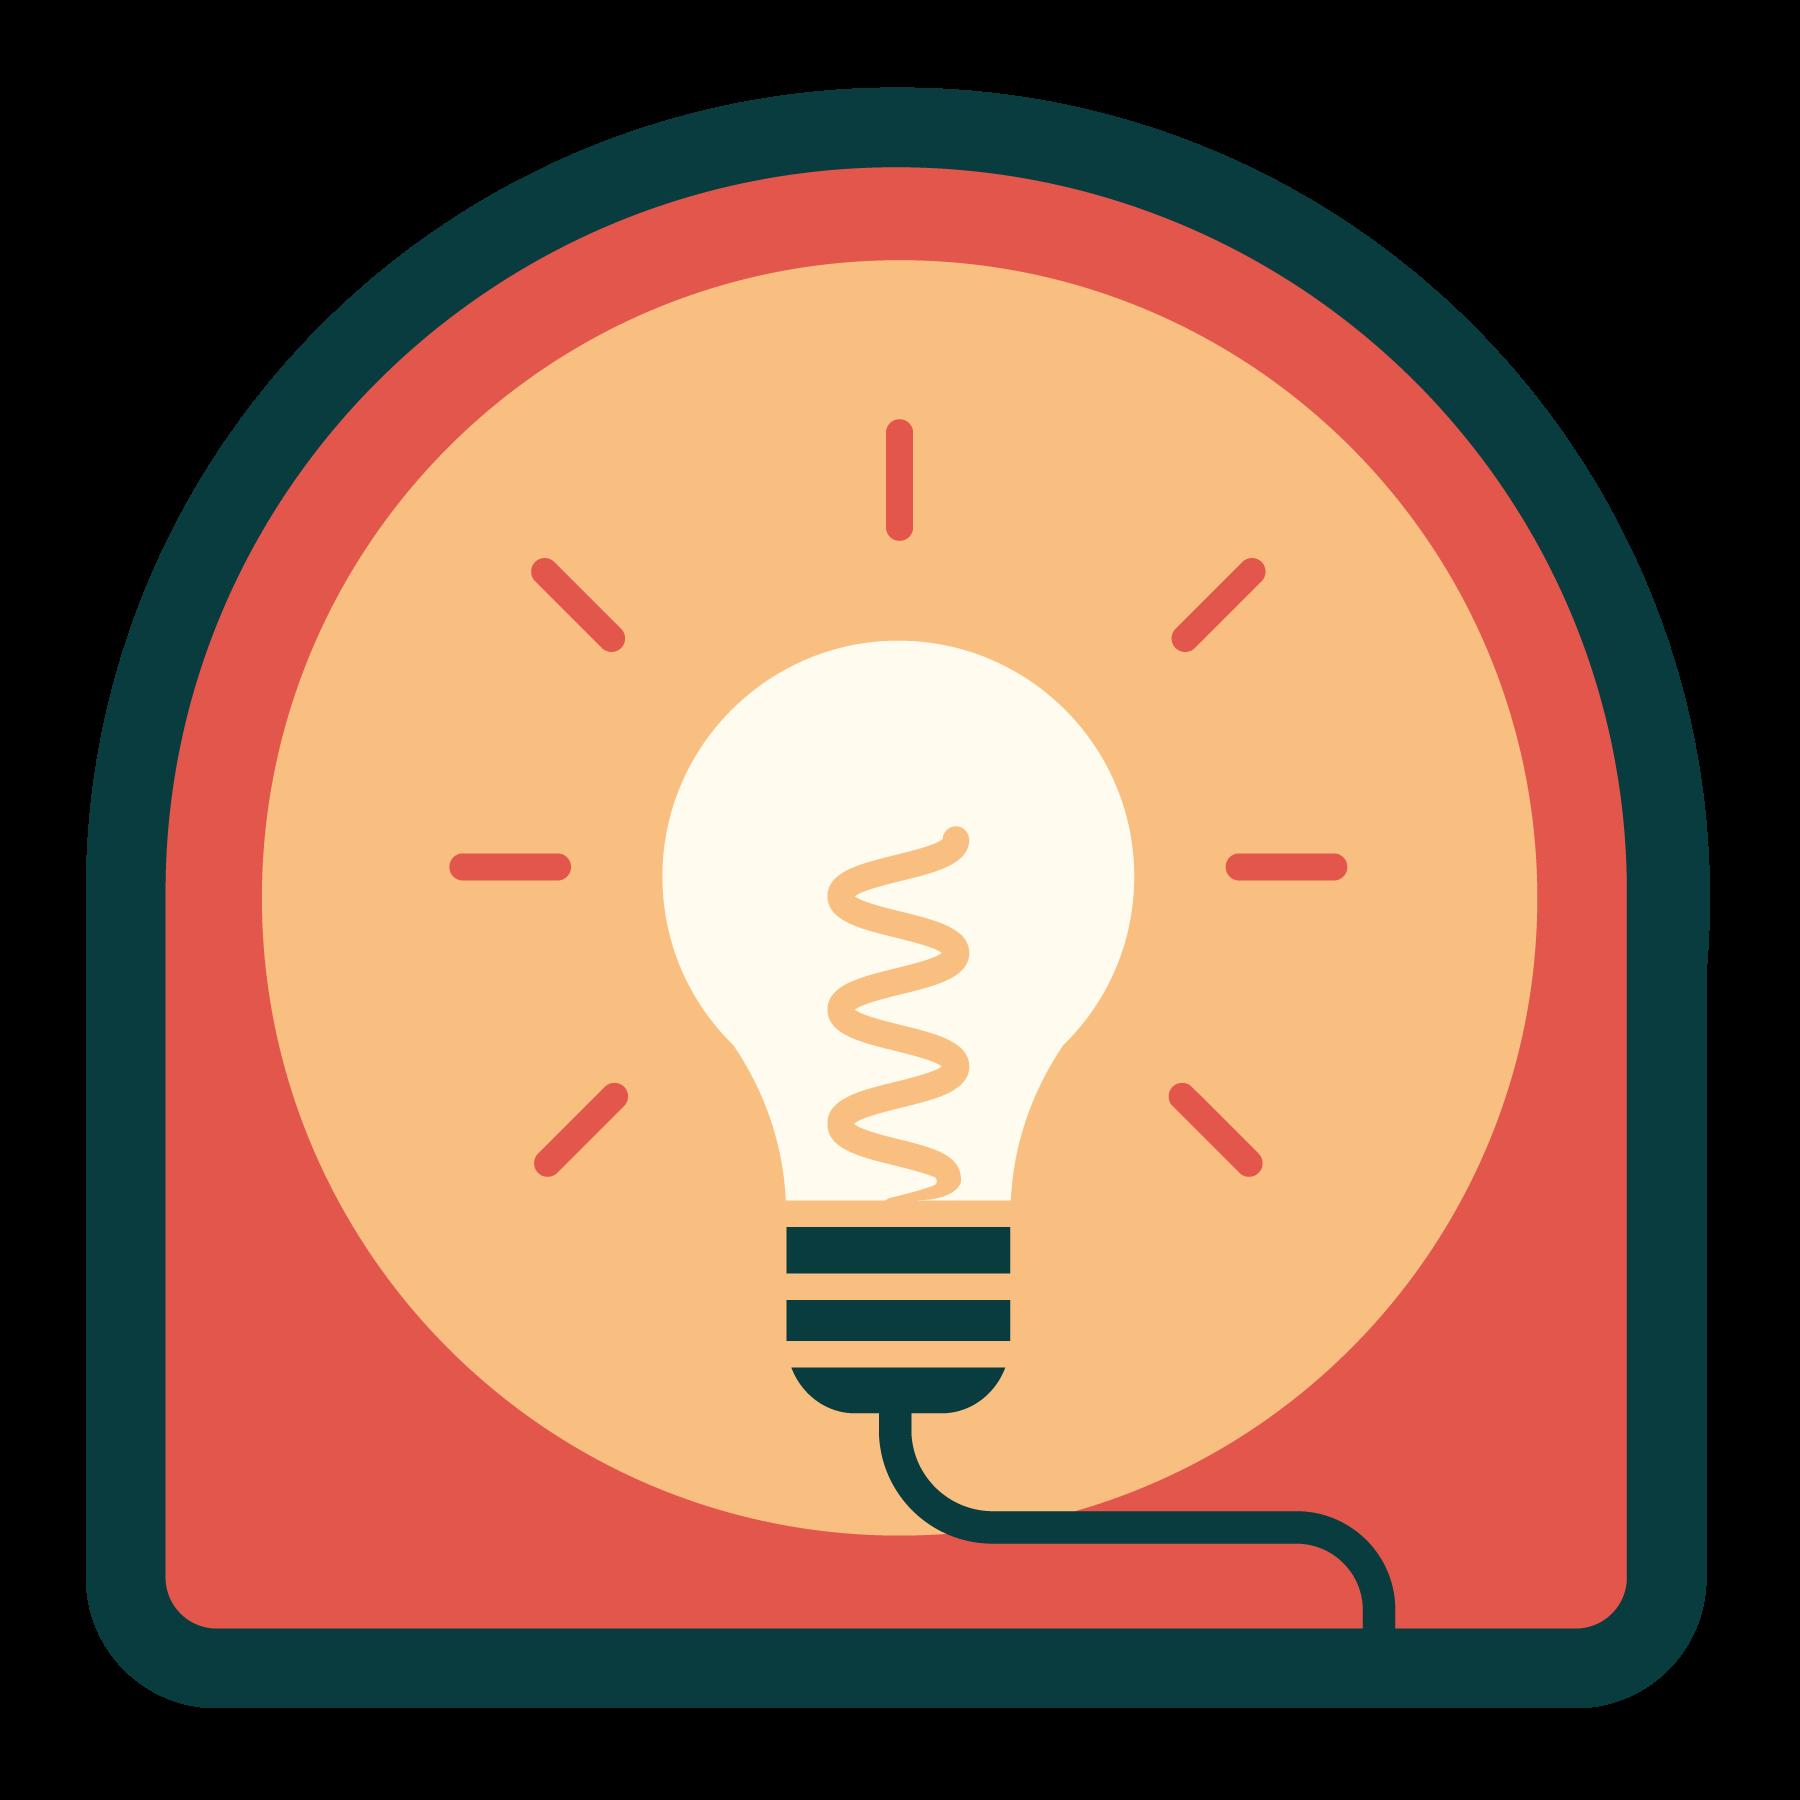 LFF009-Lightbulb-Vector-Badge.png